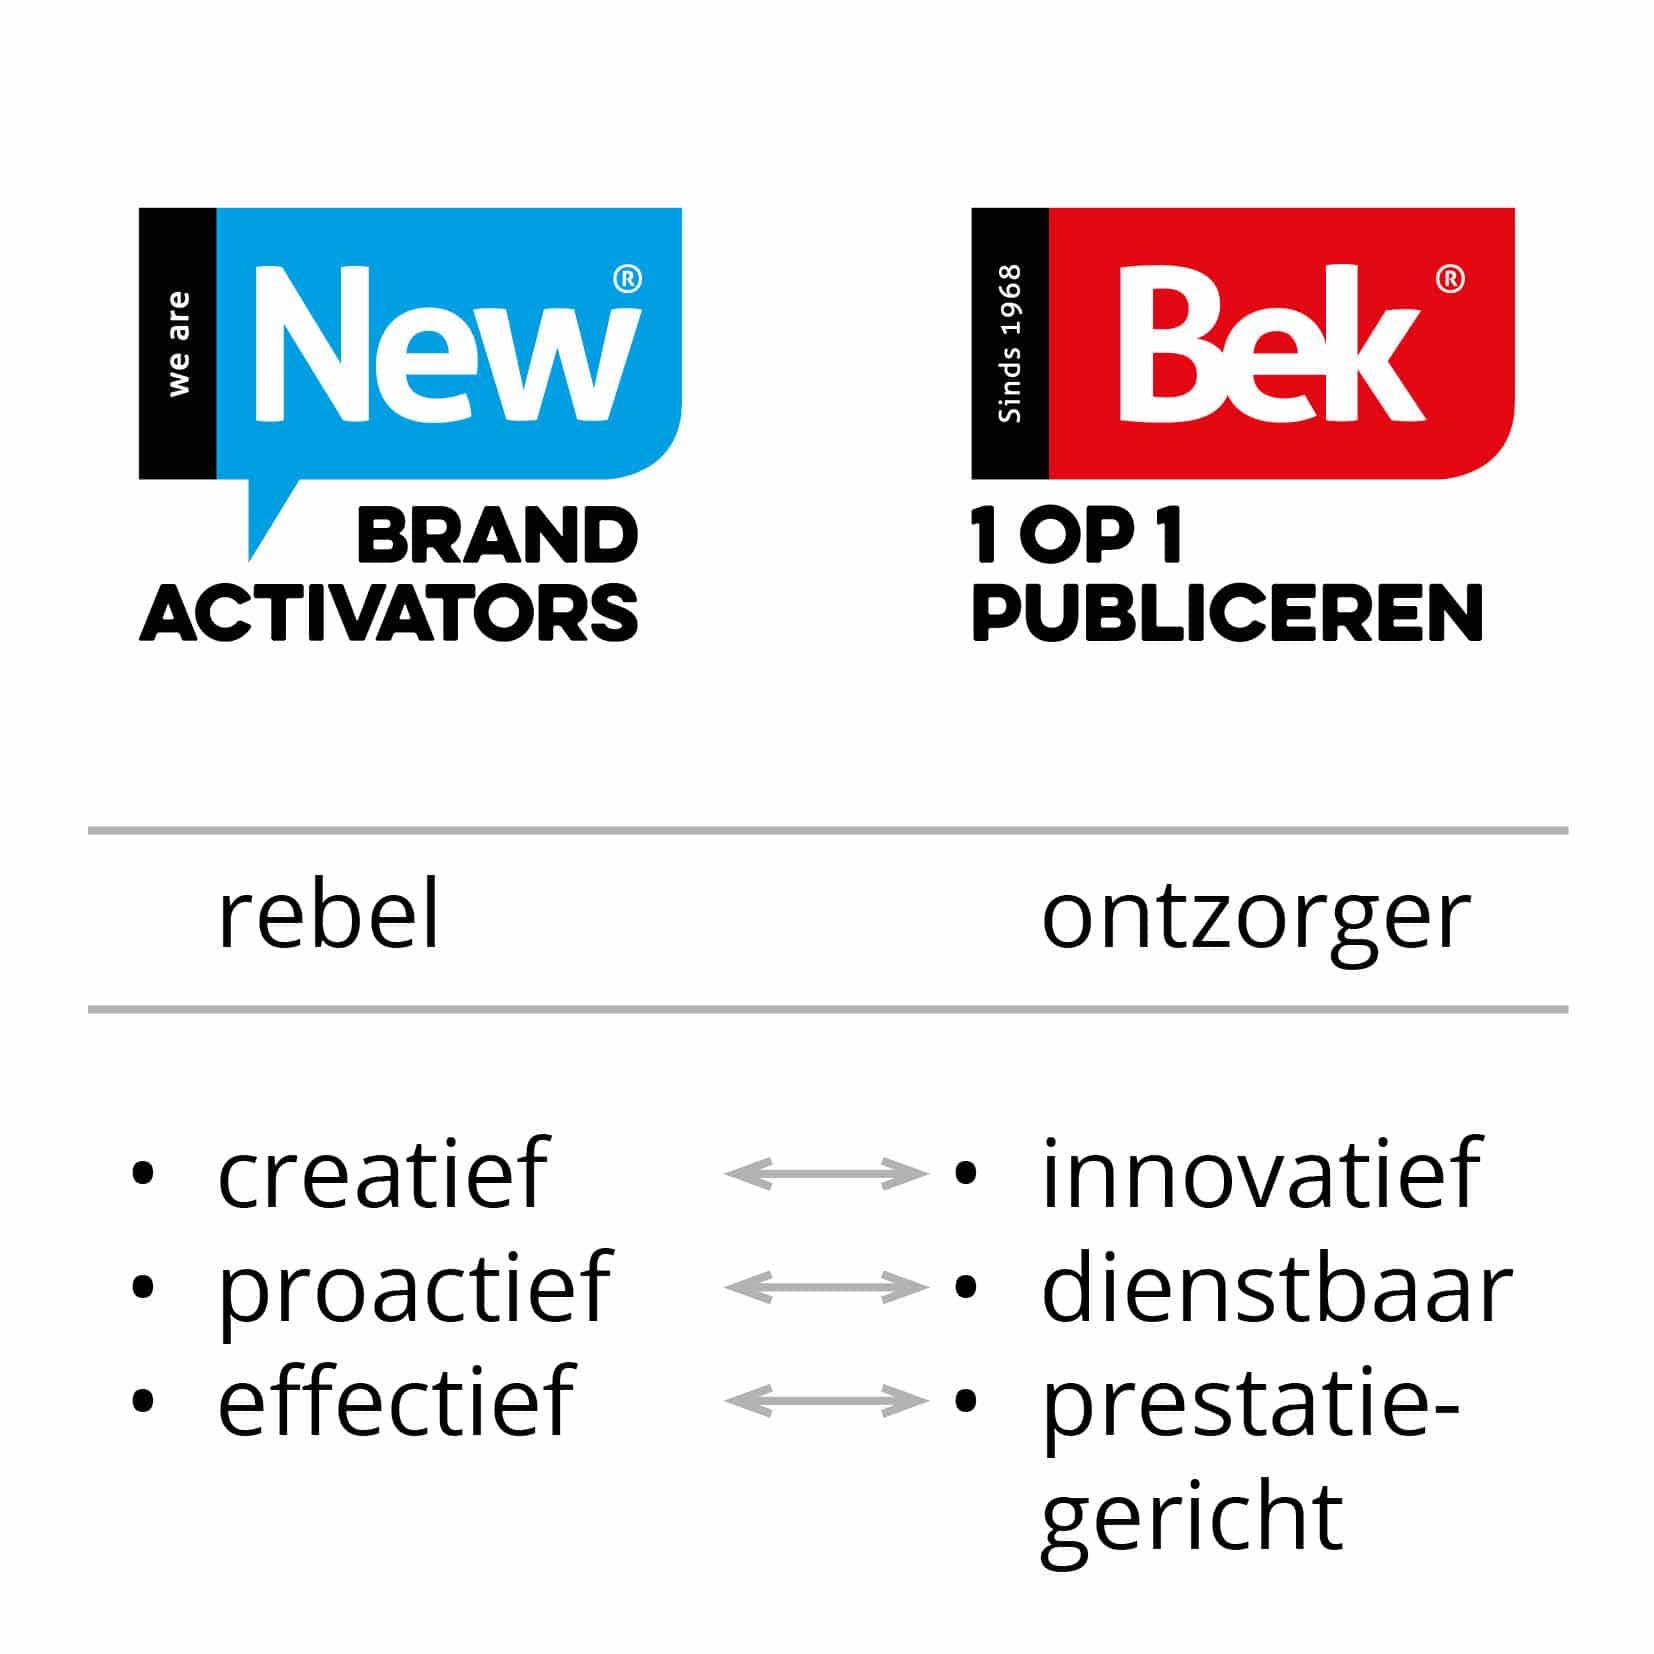 denkFrank_New-Bek-merkstrategie